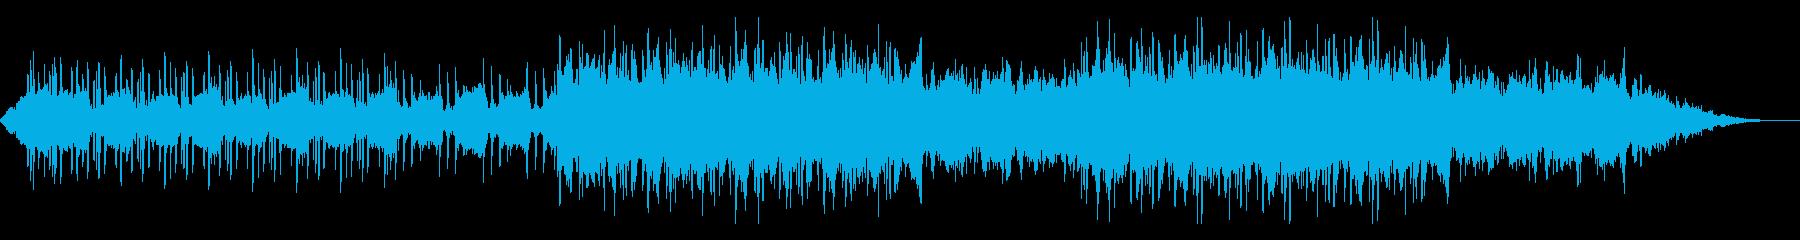 texture11の再生済みの波形